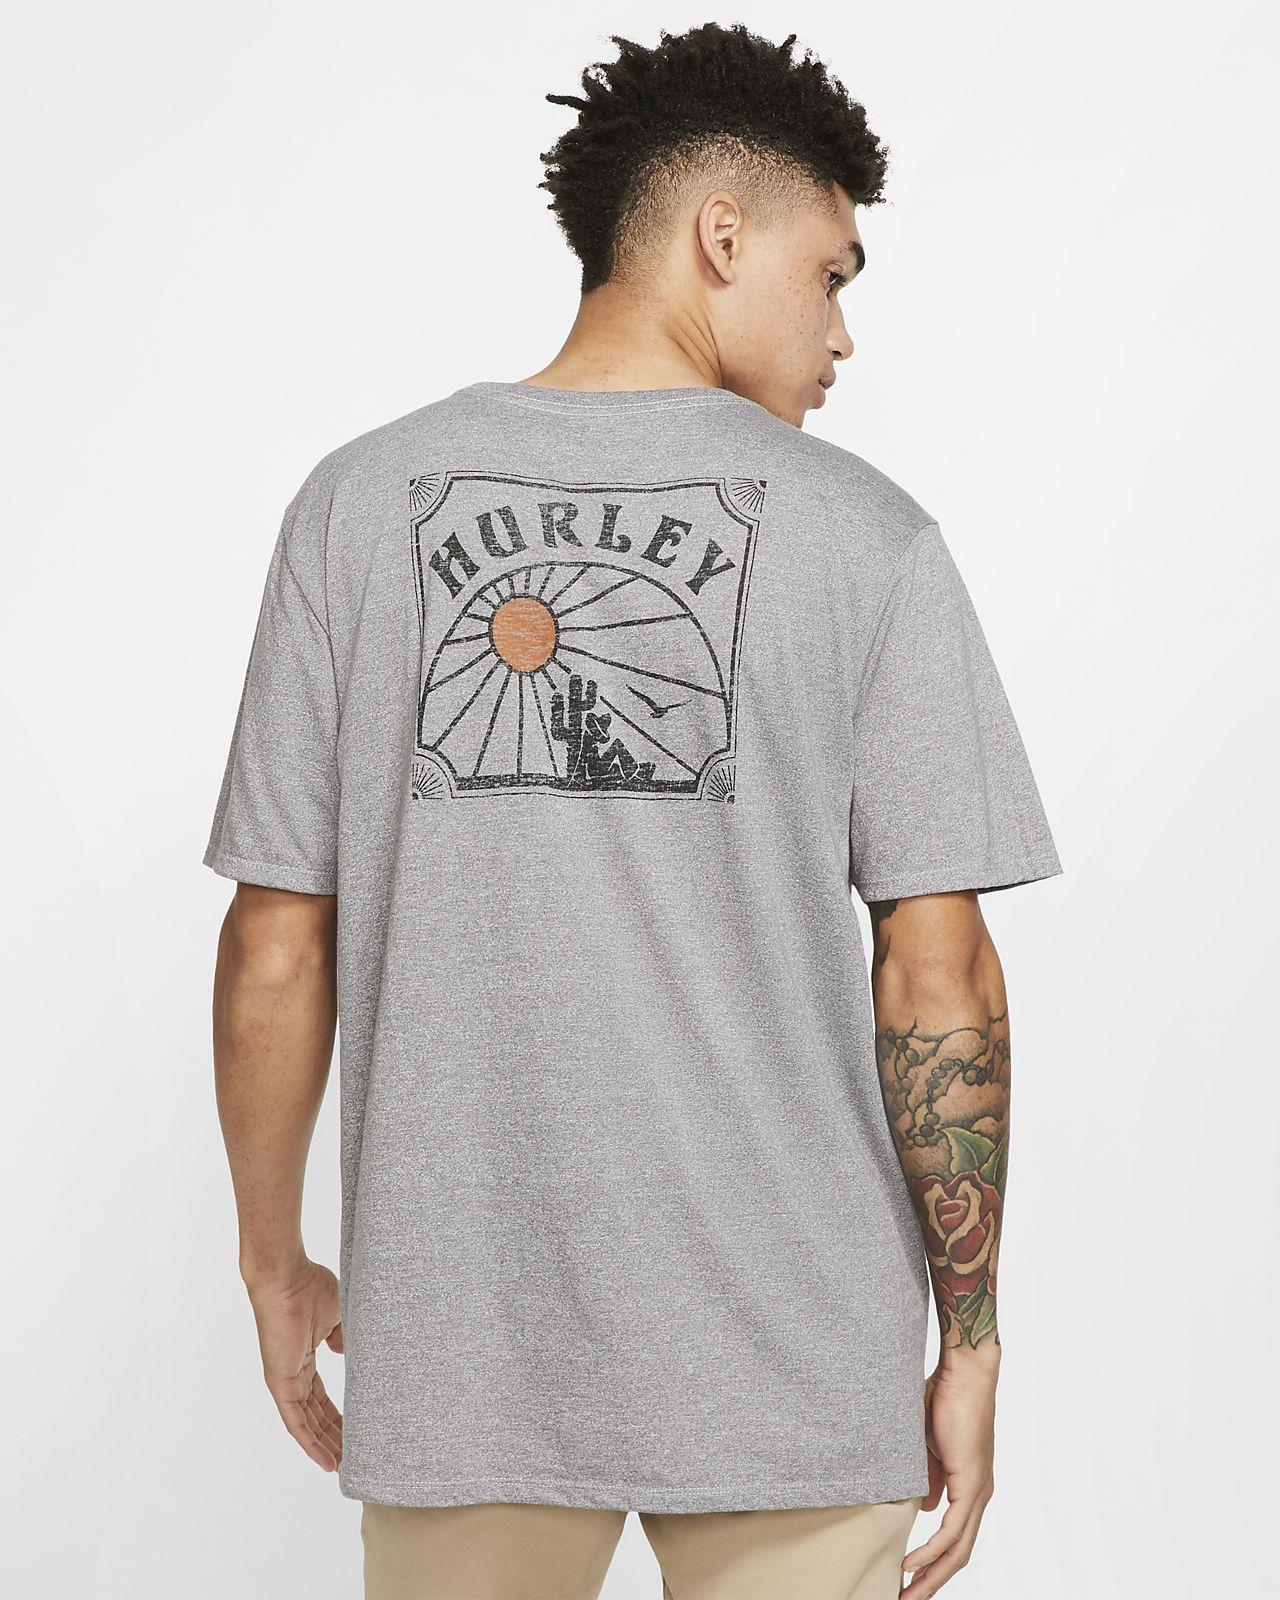 Hurley Horizon Men's T-Shirt